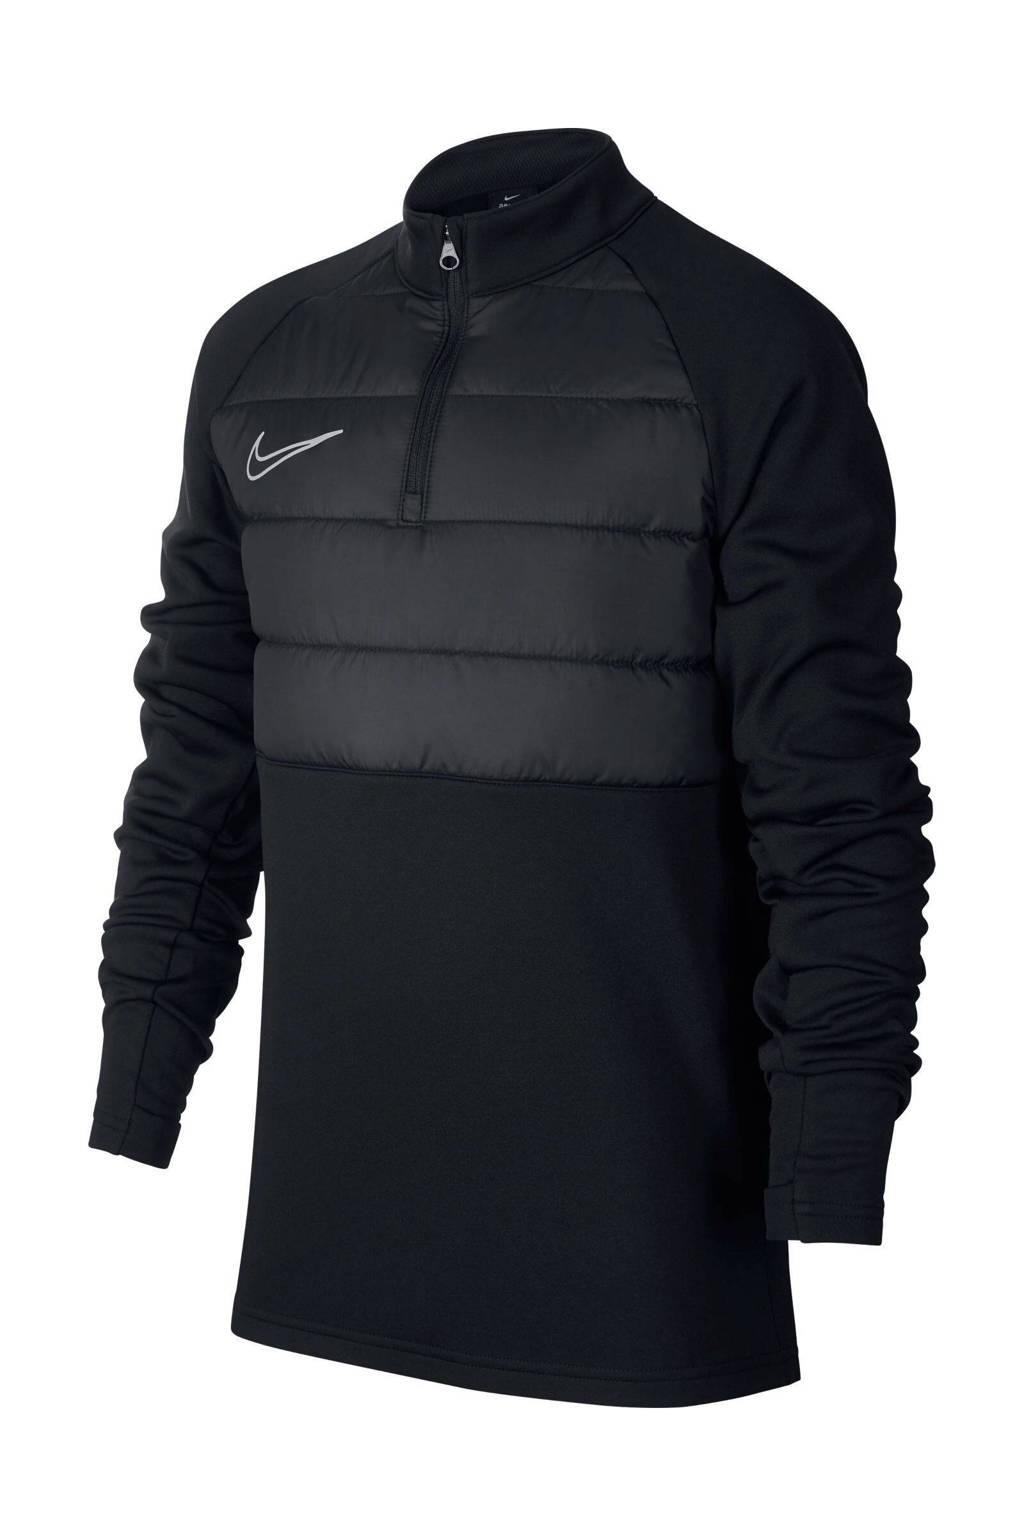 Nike   softshell sportsweater zwart, Zwart